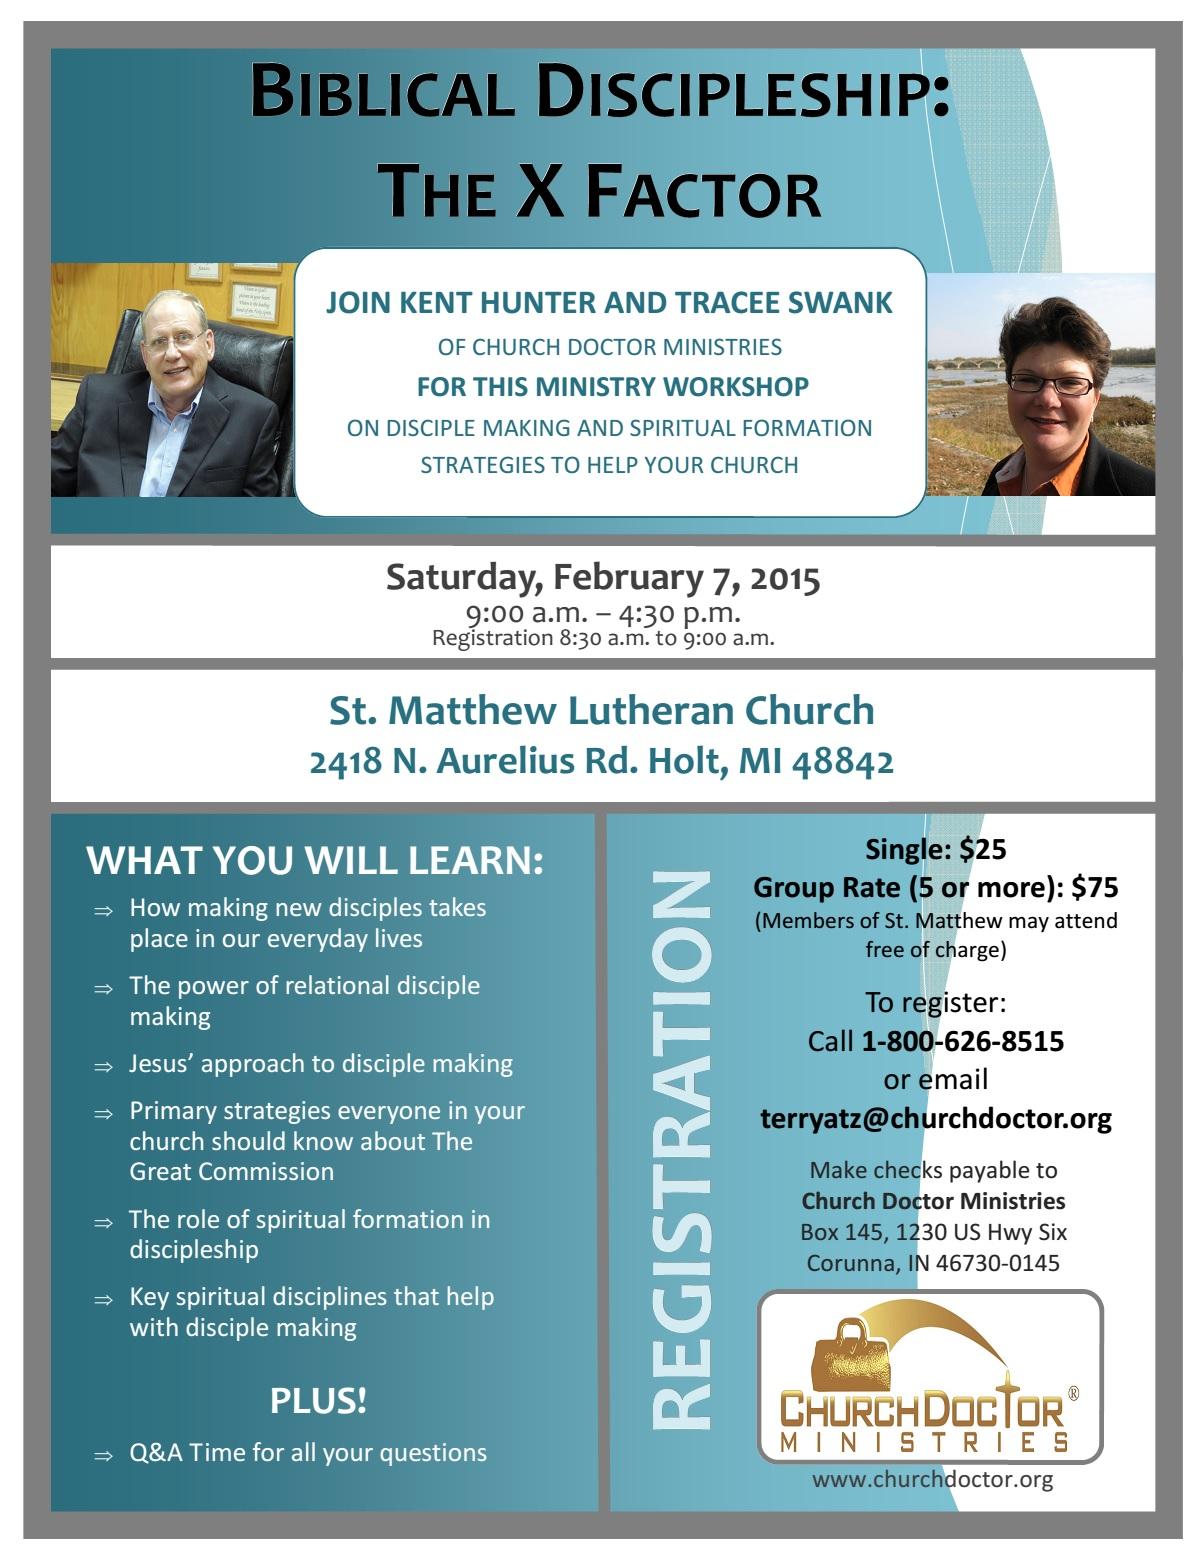 Biblical Discipleship: The X Factor – February 7 in Holt, MI